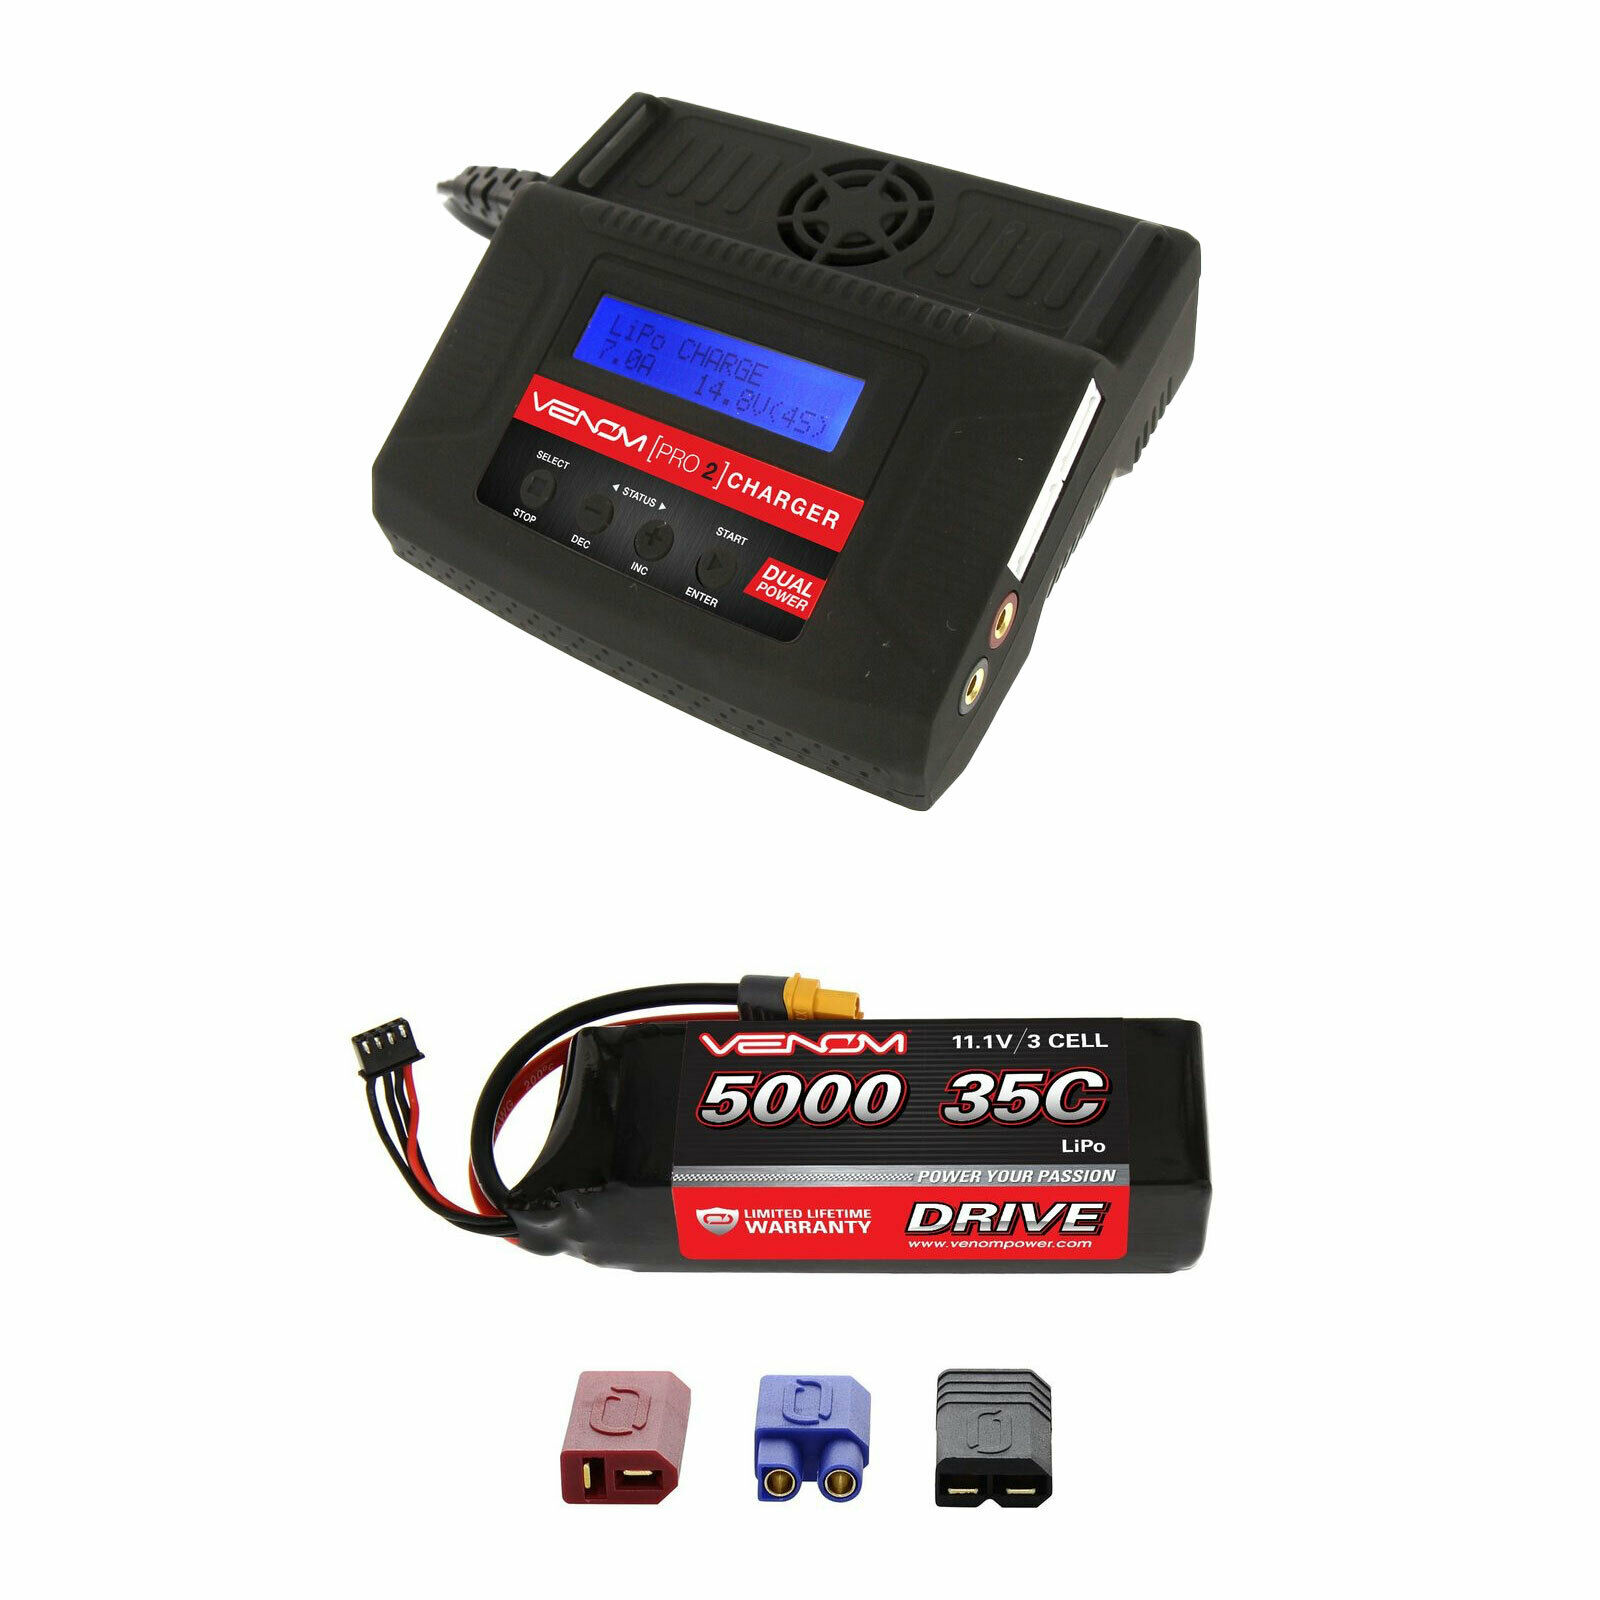 Venom 35C 3S 5000mAh 11.1V batería LiPo con Pro 2 Cargador Combo